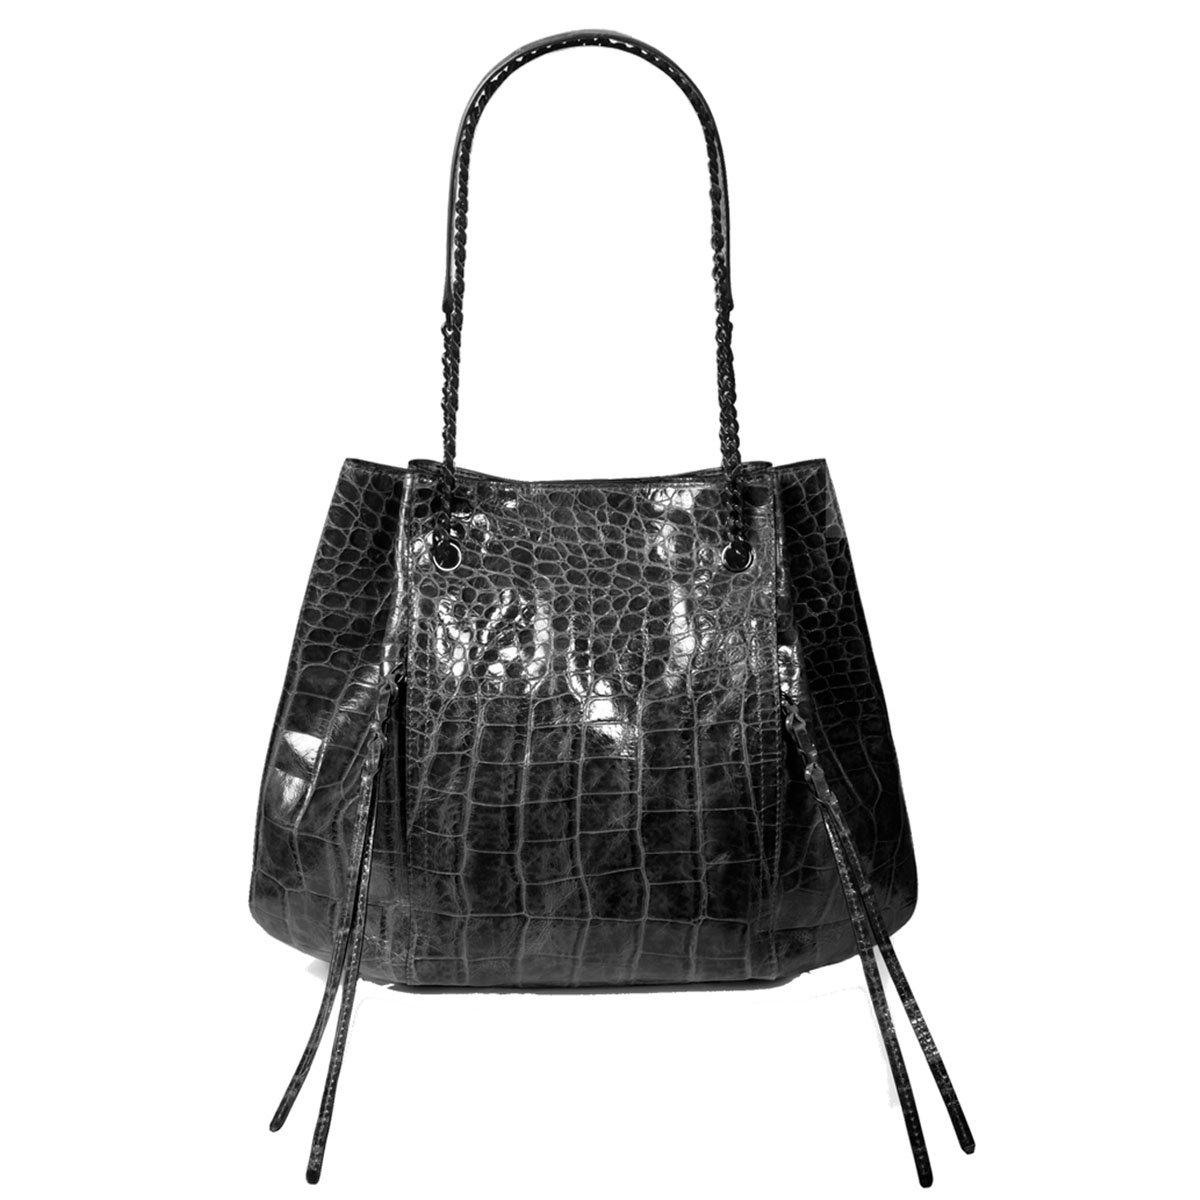 Eric Javits Luxury Designer Women's Fashion Handbag - Leigh Tote - Black